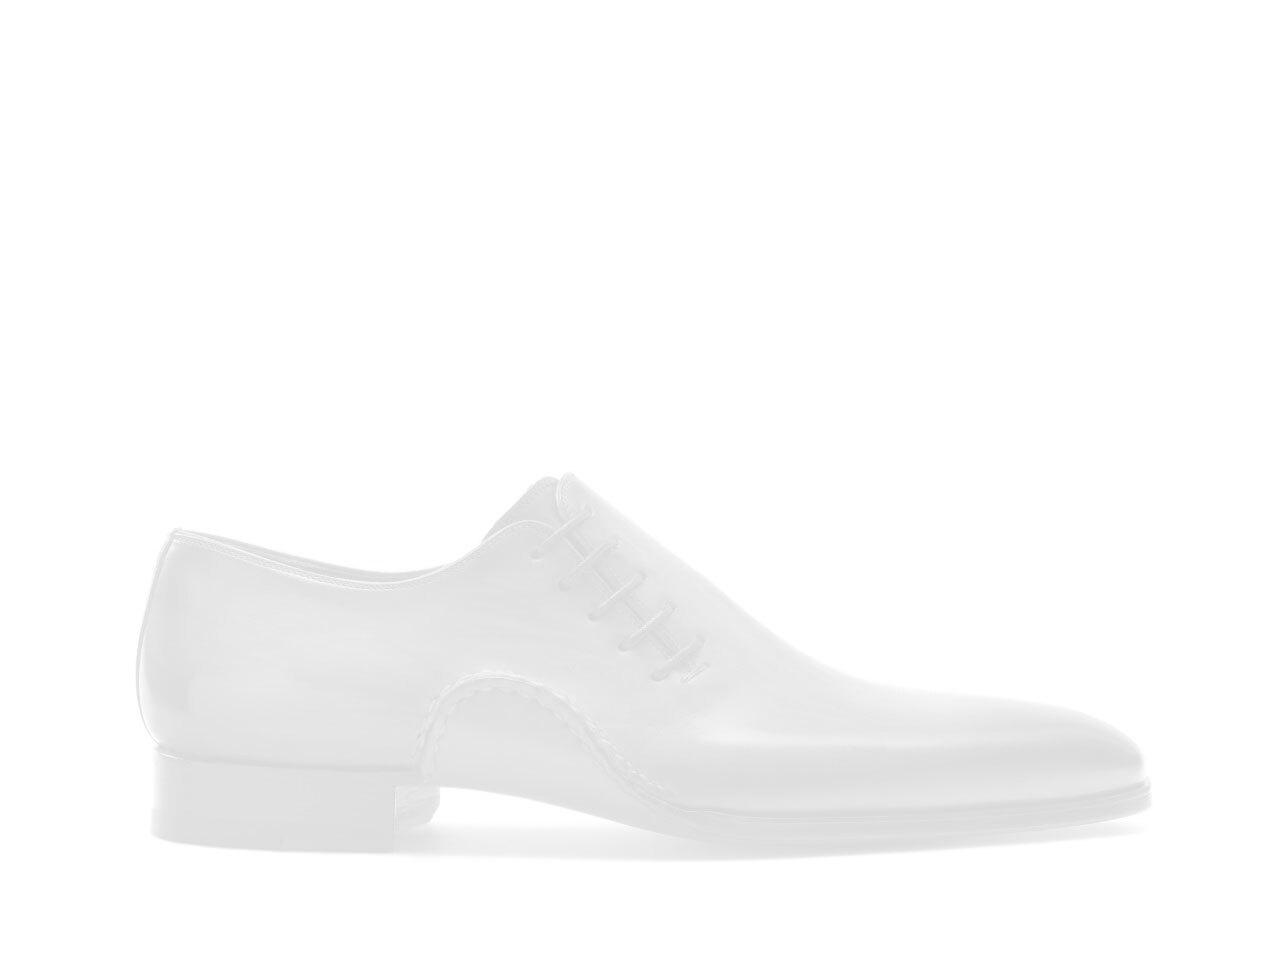 Sole of the Magnanni Basilio Lo Cuero Men's Sneakers